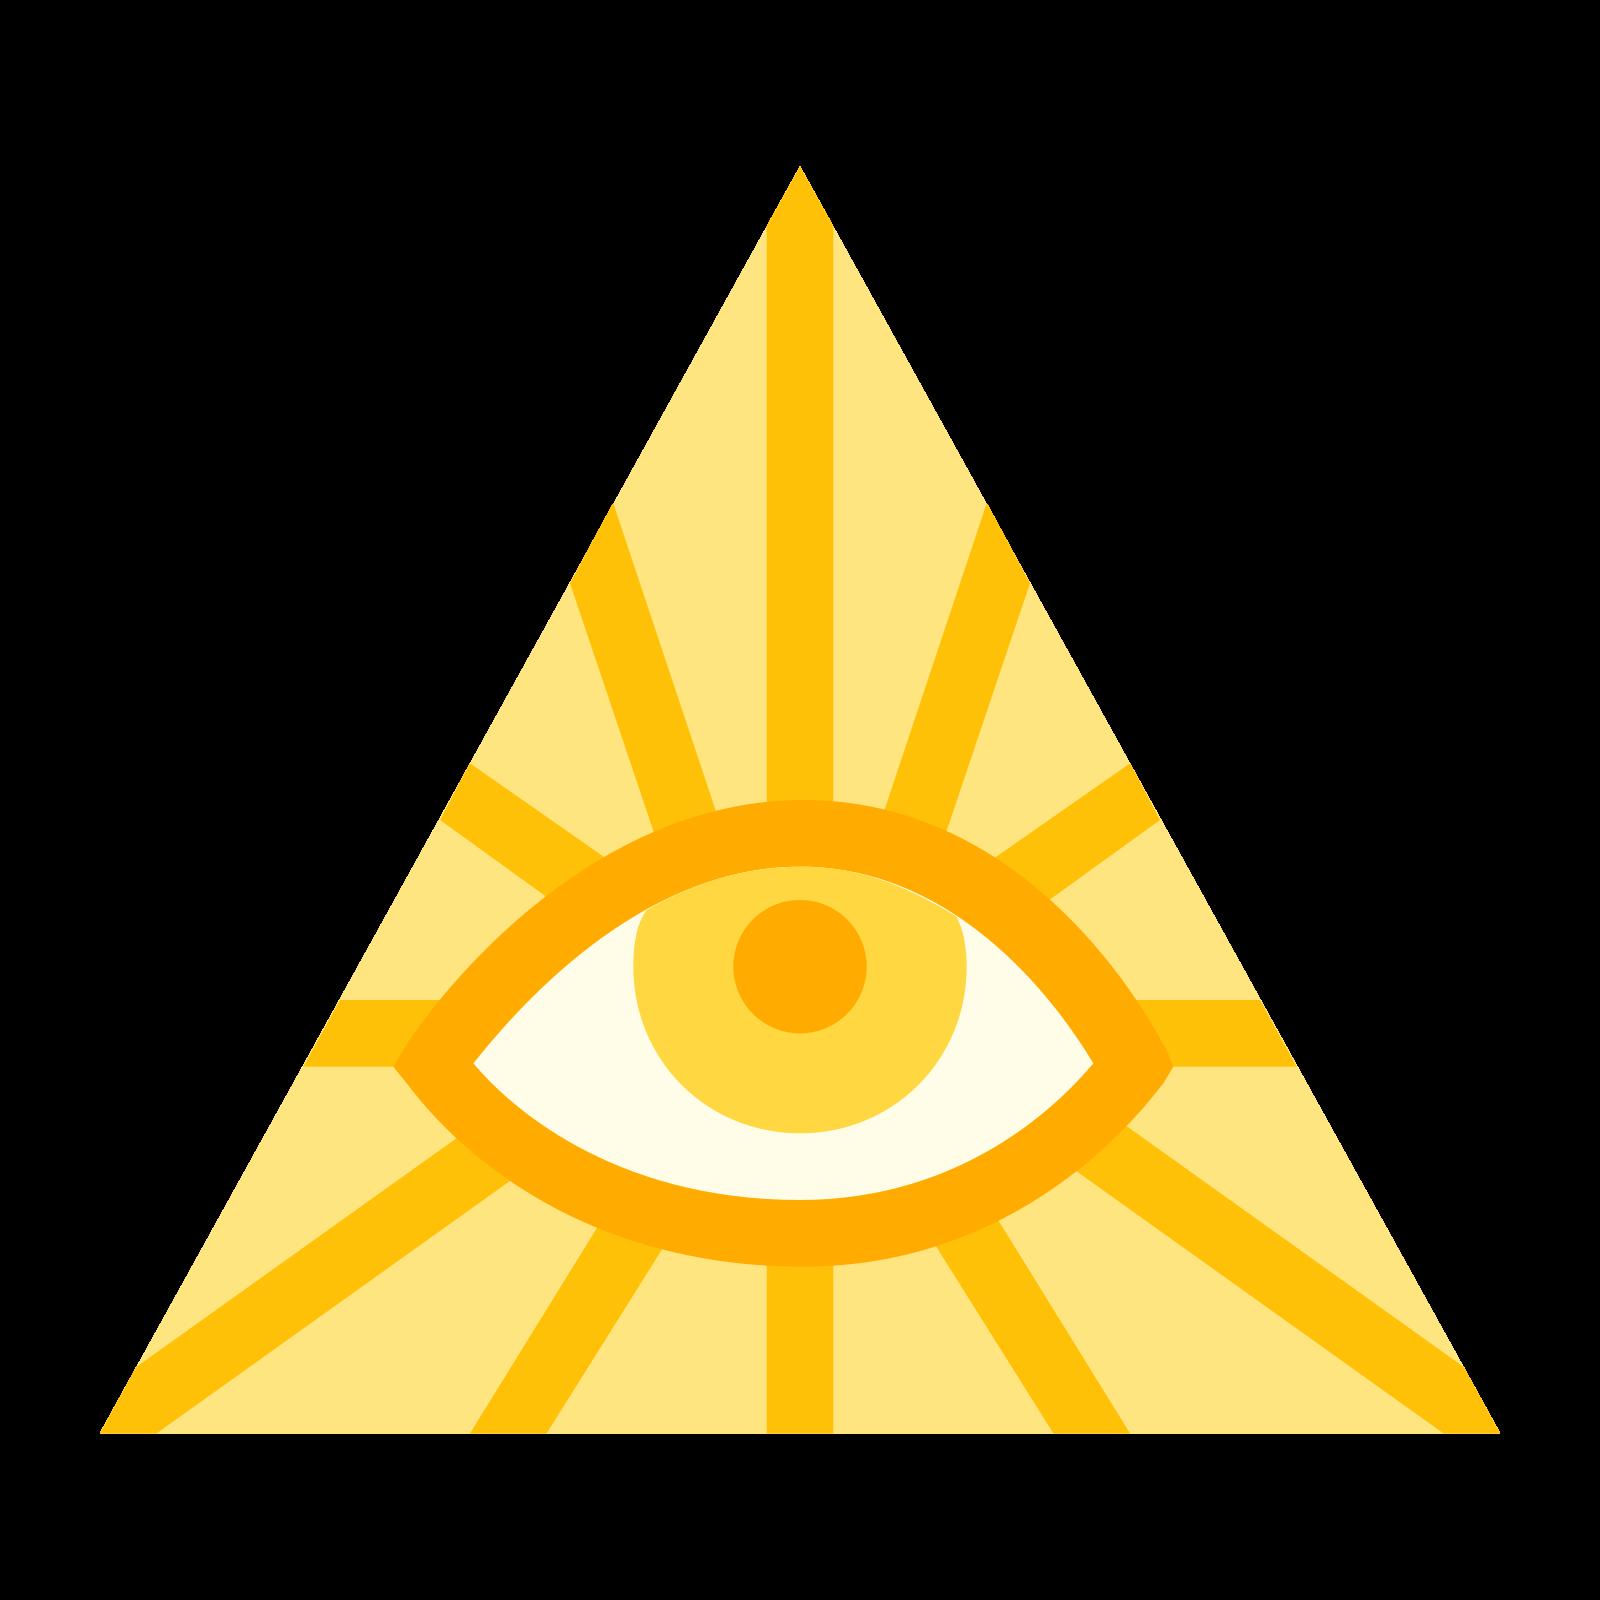 Symbol Illuminati icon